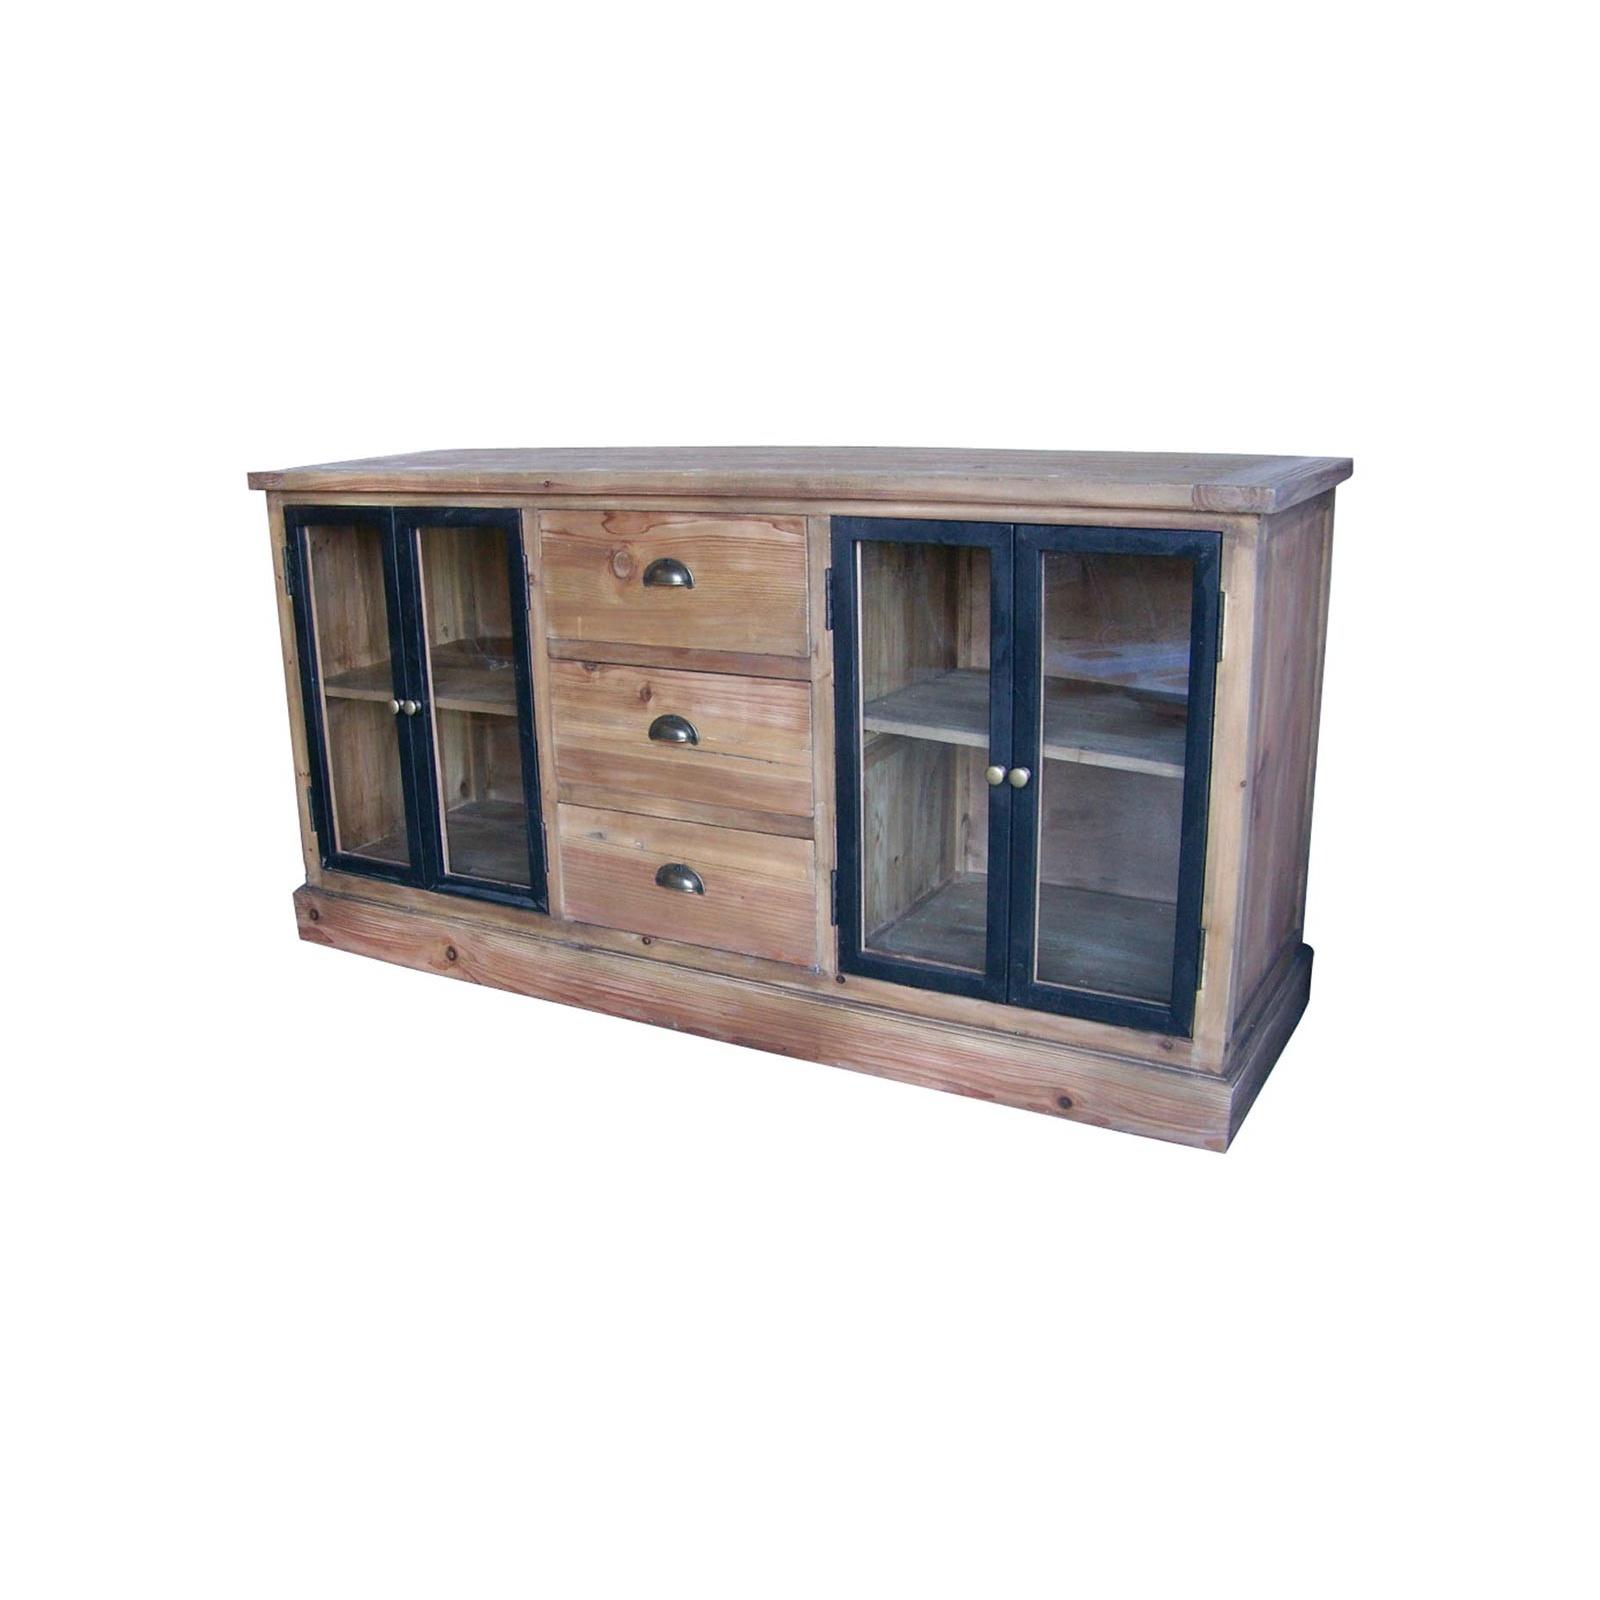 bas de buffet vitr jp2b d coration. Black Bedroom Furniture Sets. Home Design Ideas